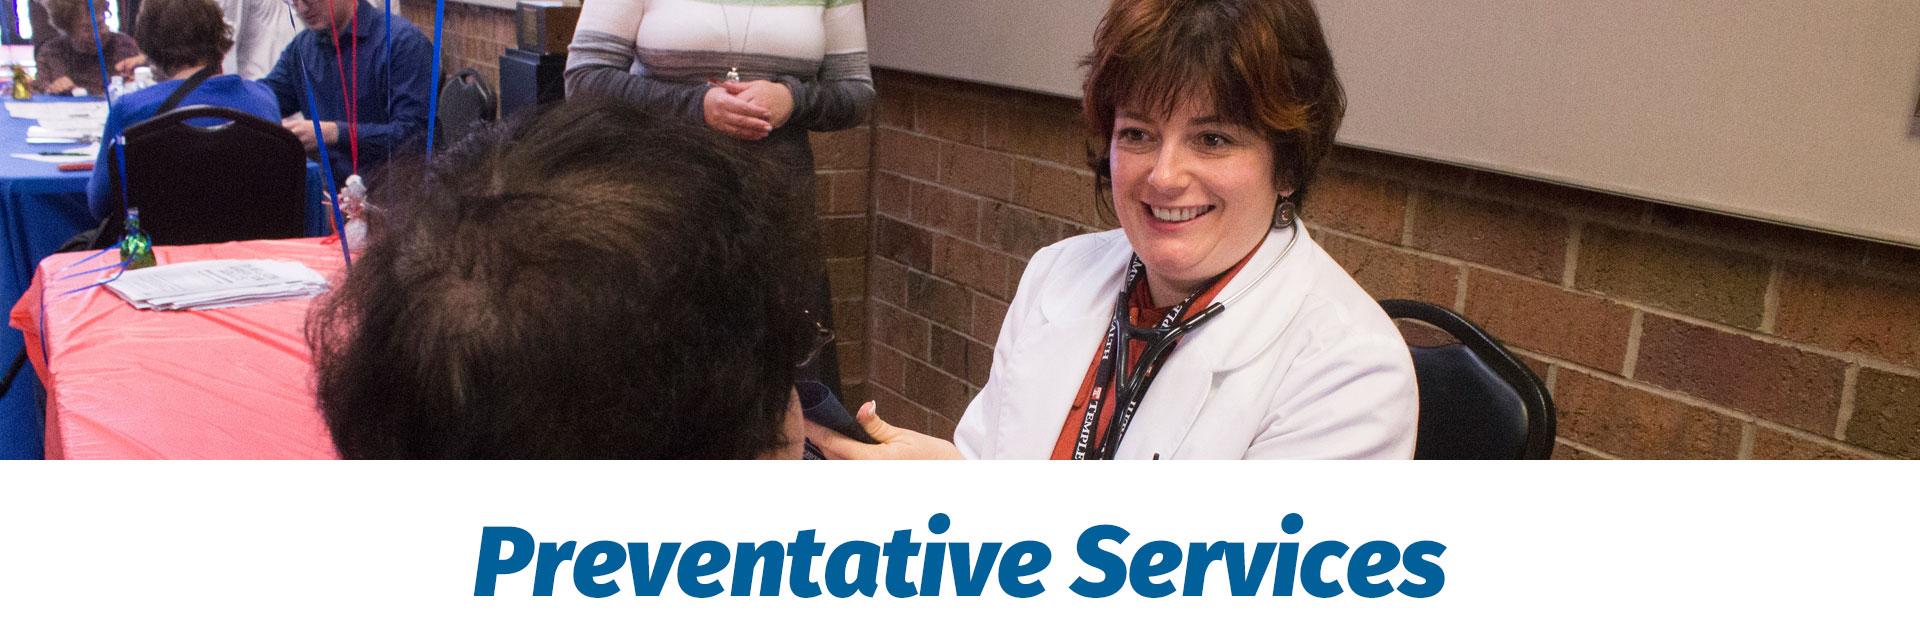 kleinlife preventative services, preventative services kleinlife,